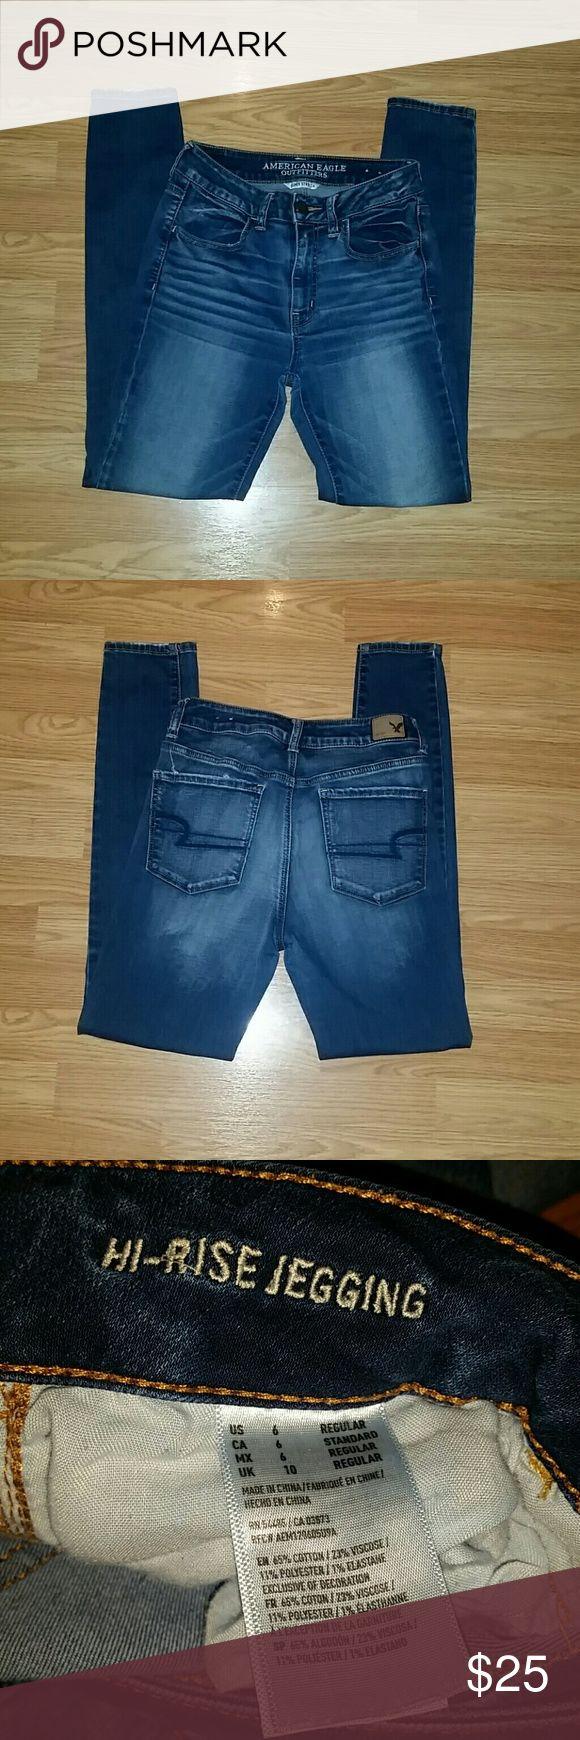 AMERICAN EAGLE JEANS HI-RISE JEGGING JEANS FROM AMERICAN EAGLE - SIZE 6 American Eagle Outfitters Jeans